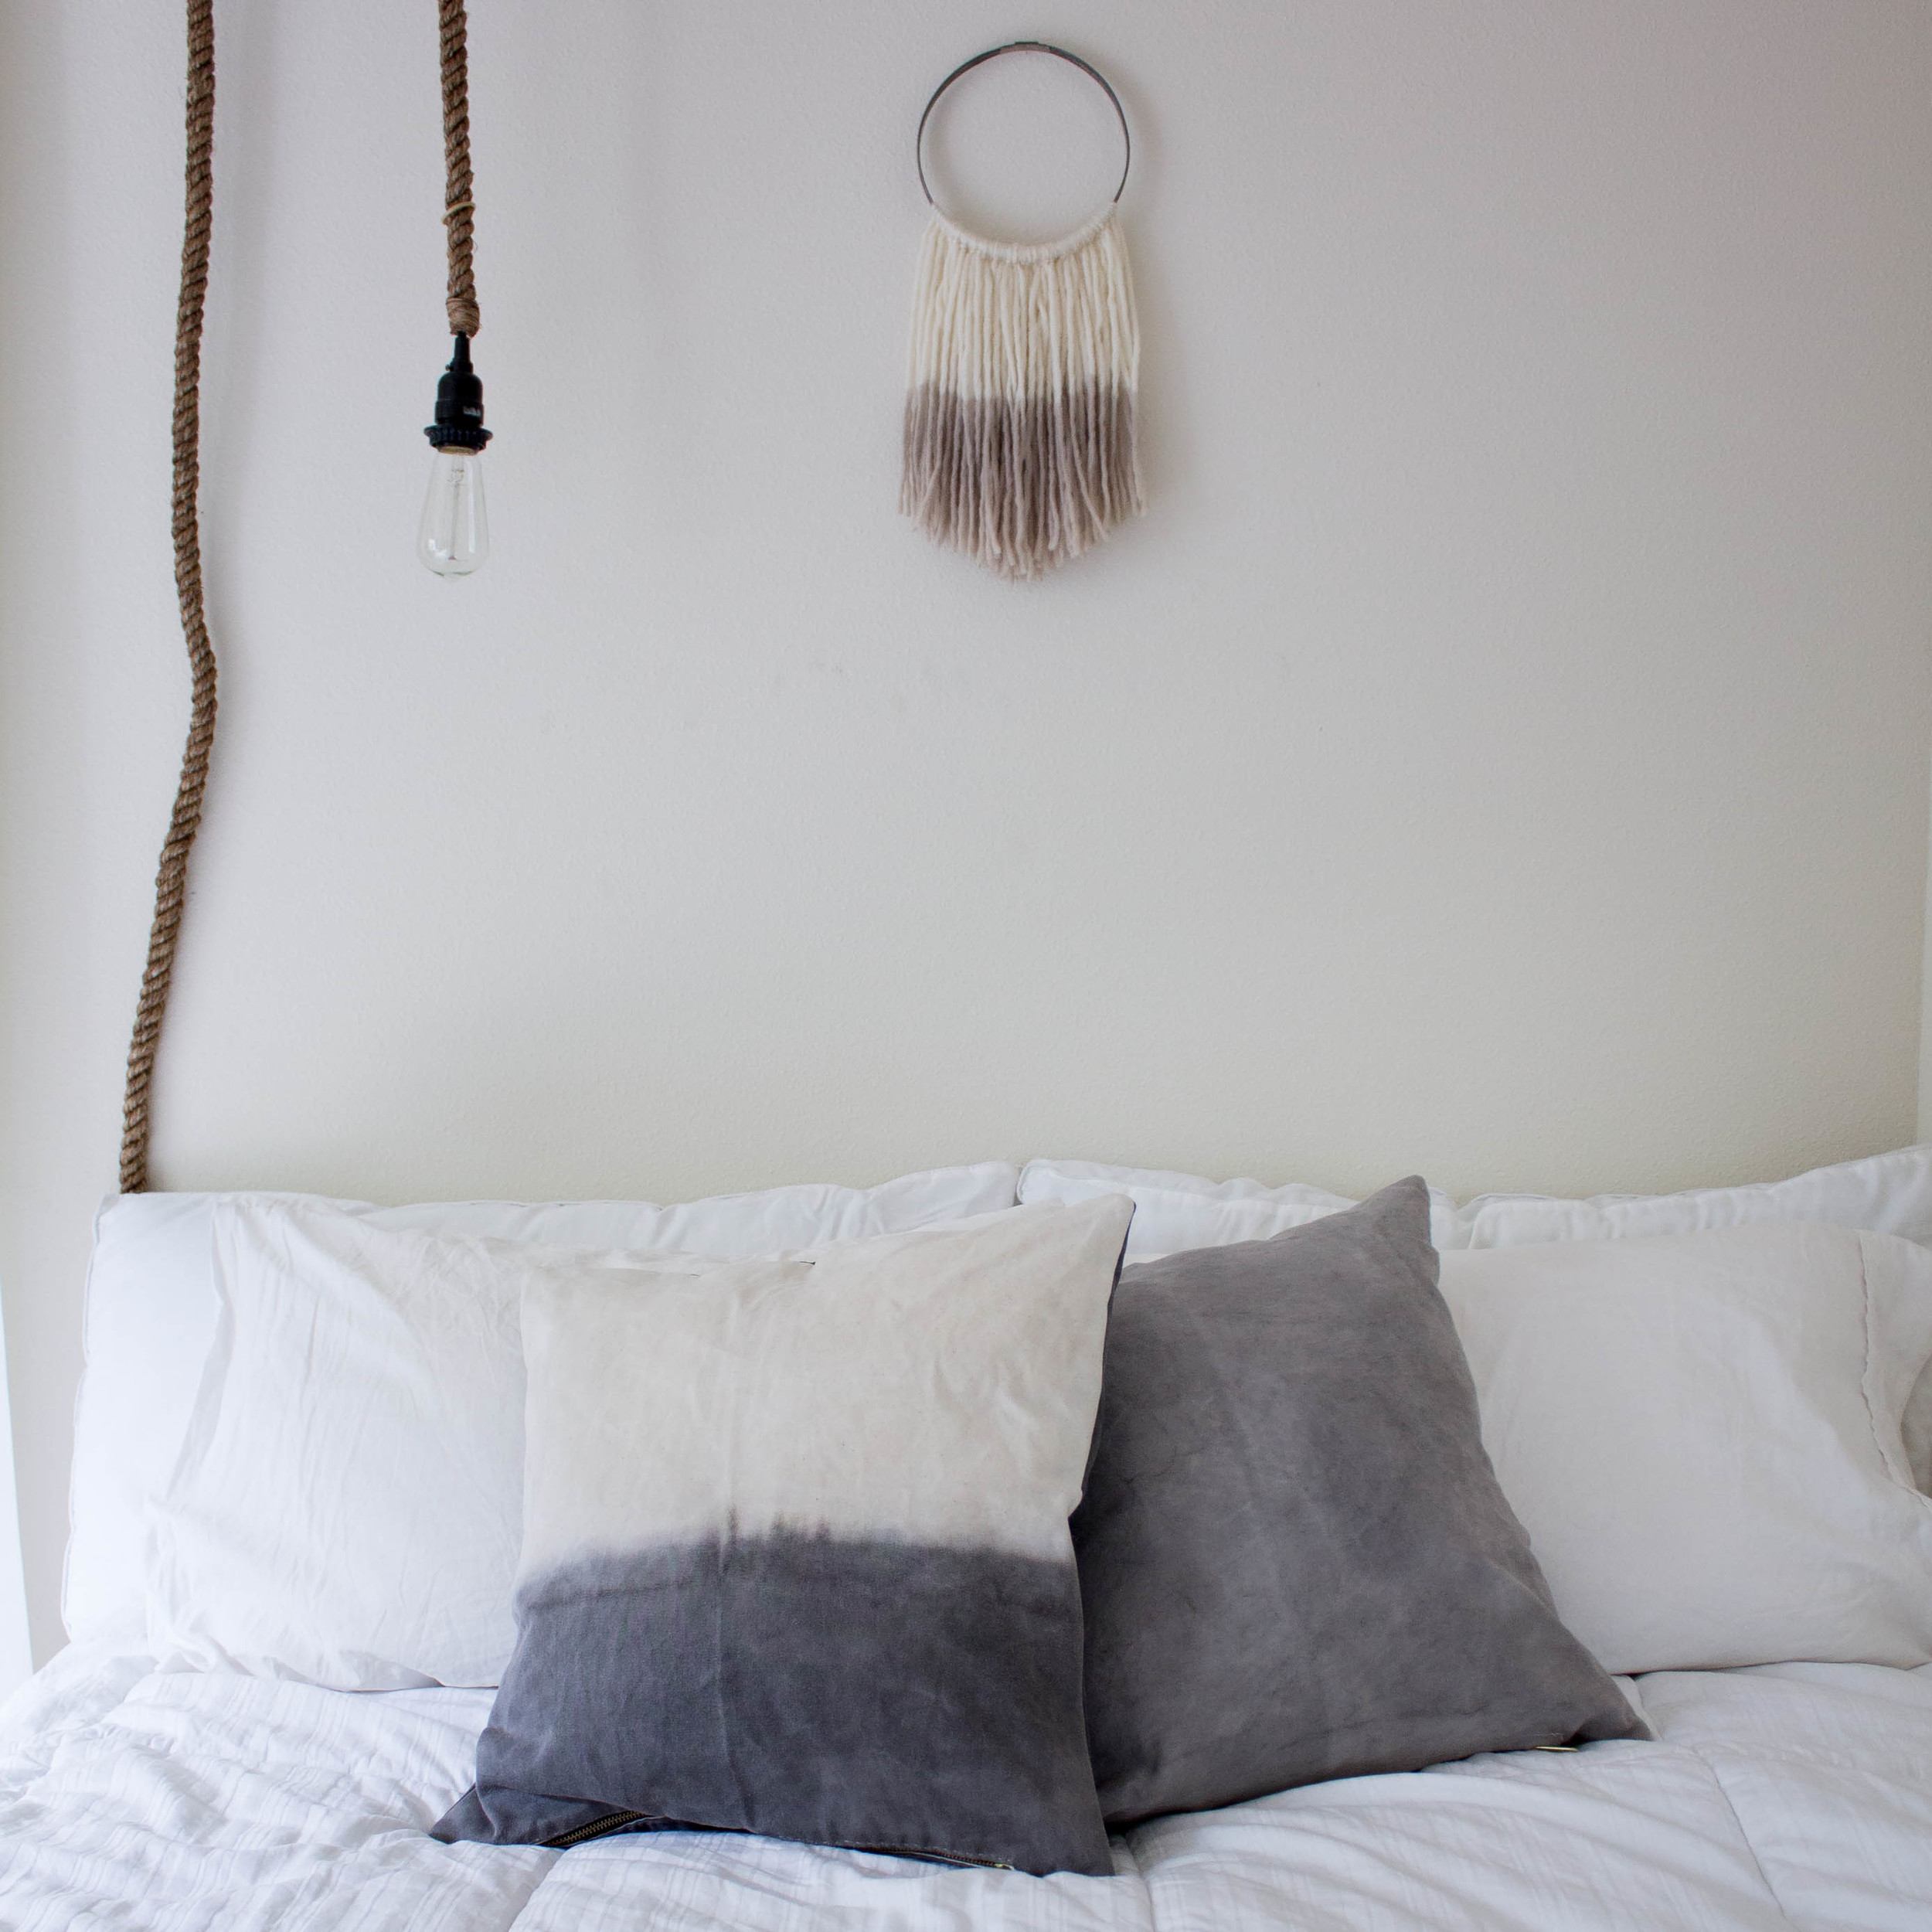 Natural Acorn Dye // Organic Waxed Canvas Pillow // $149